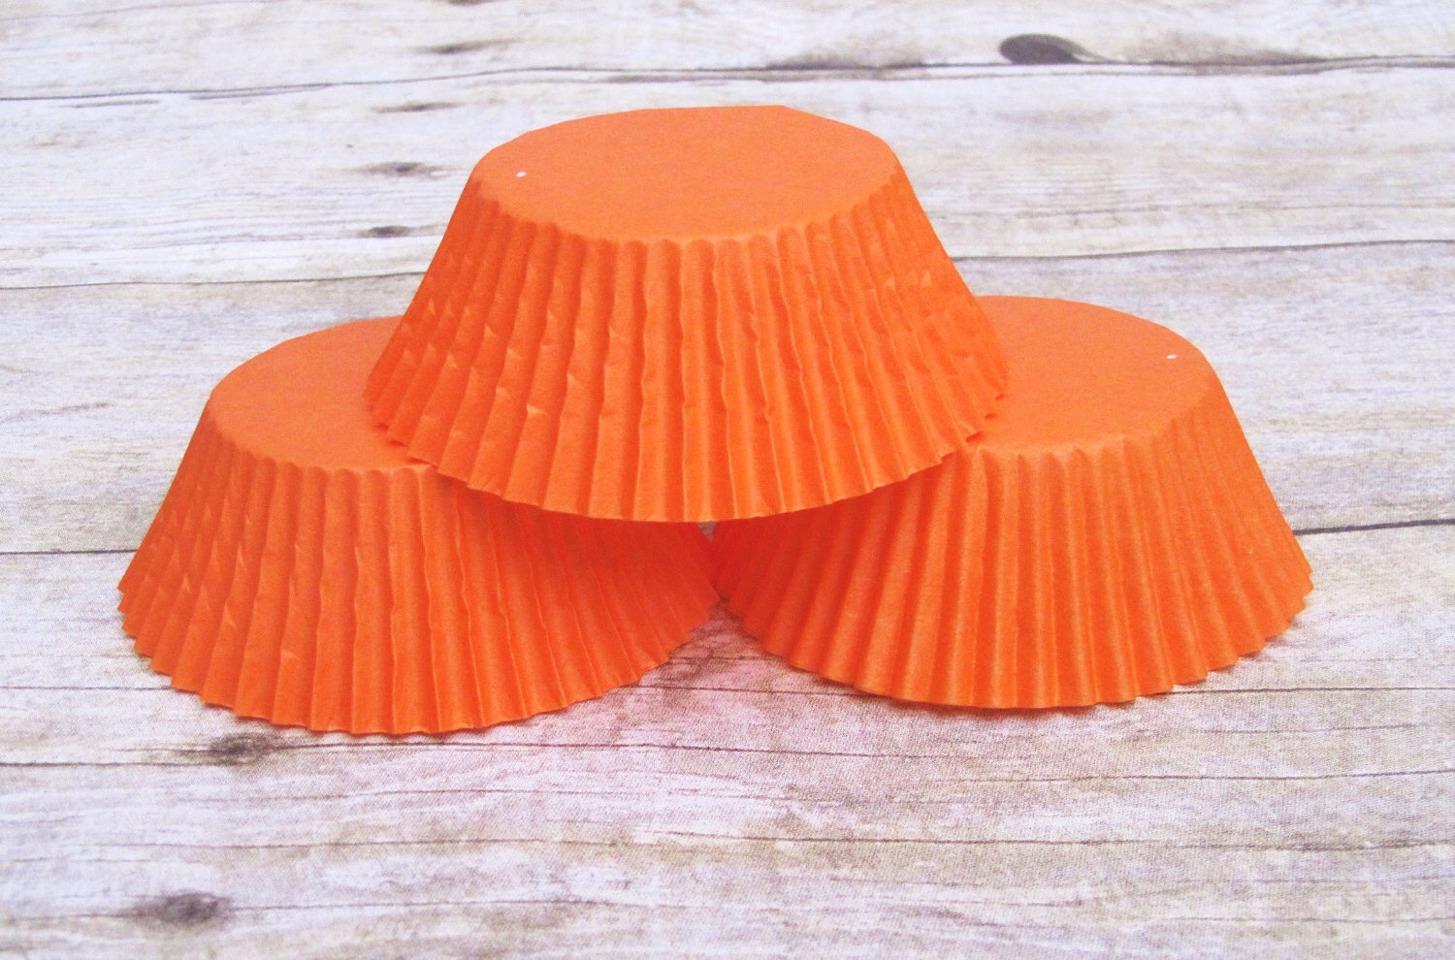 1. Get orange cupcake liners.